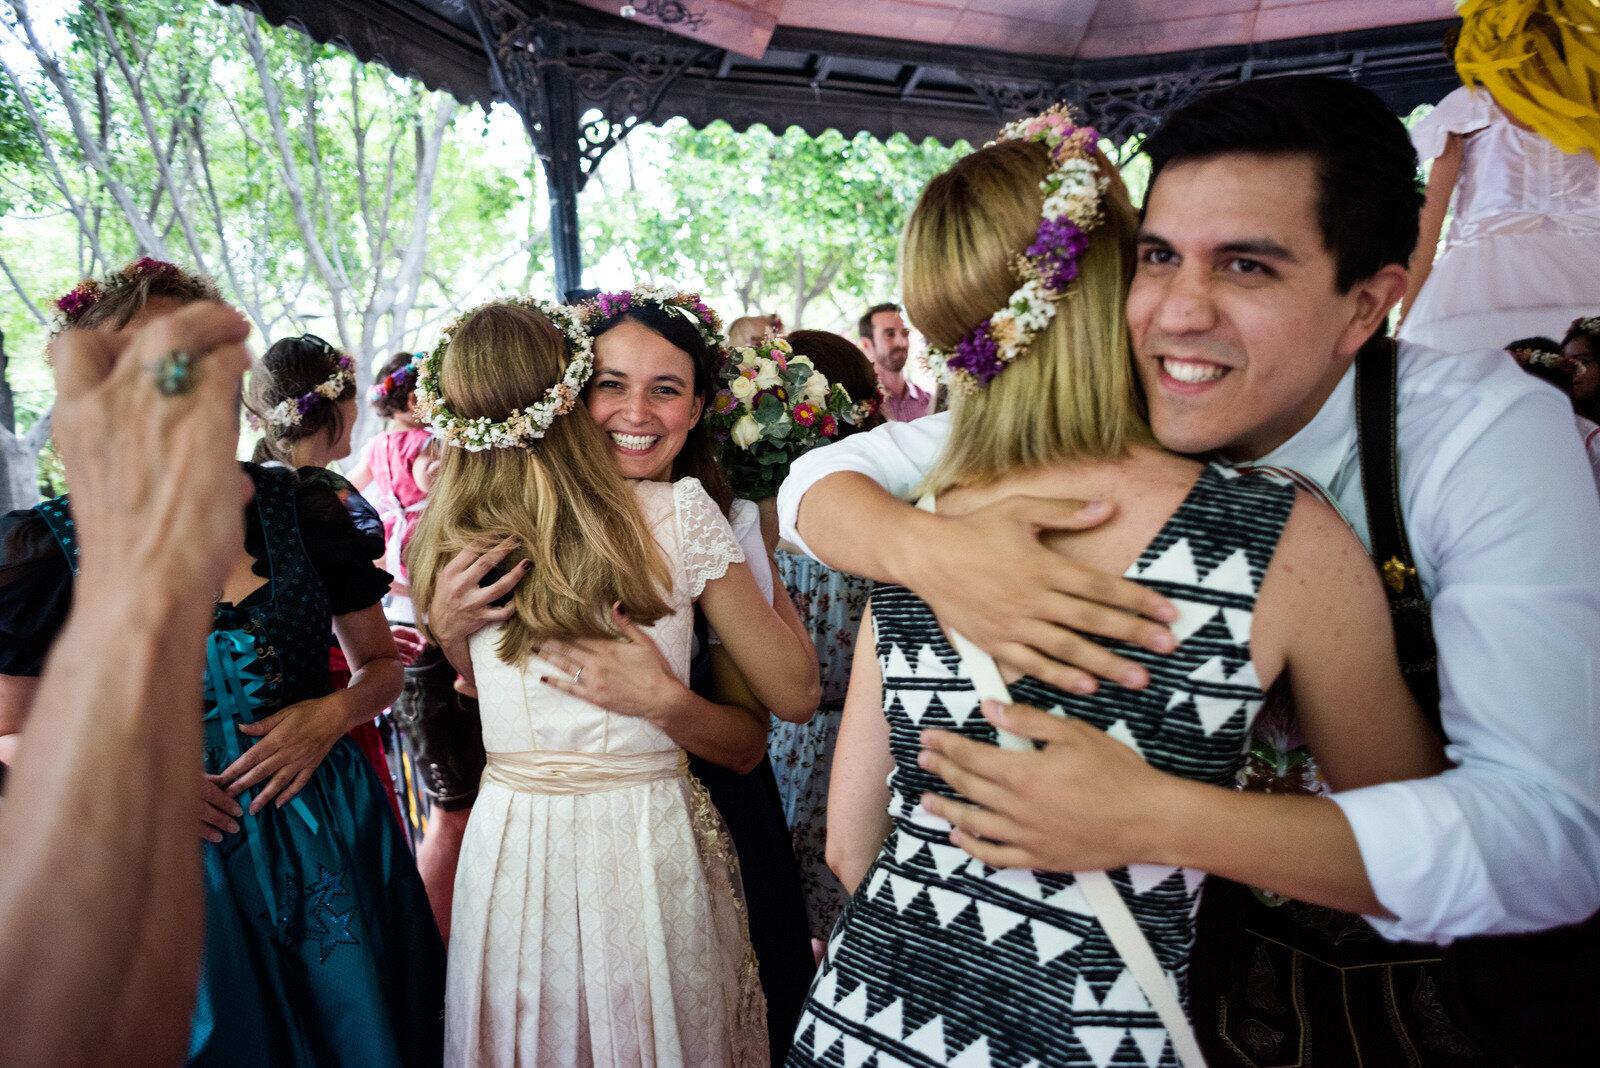 callejoneada_san_miguel_de_allende_wedding_photography_ (3).jpg